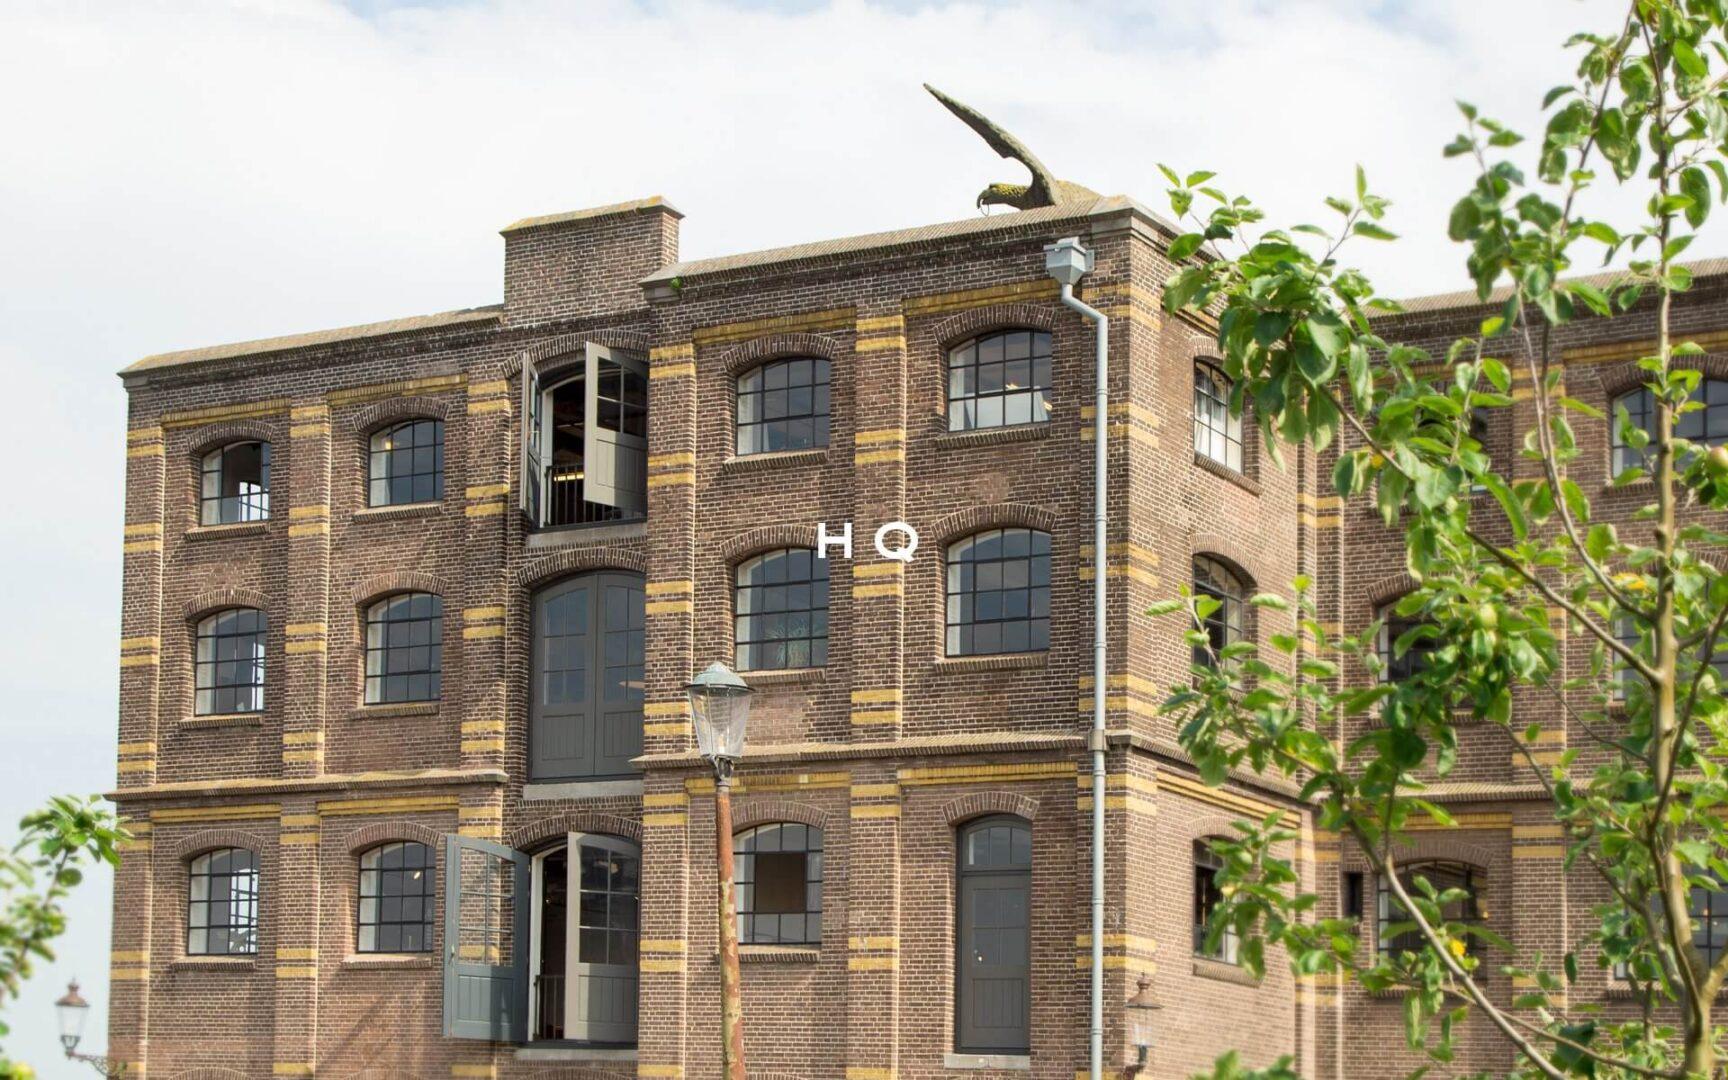 Architect-industrieel-monument-Adelaar-Zaandam-architectenbureau-Noord-Holland-Zijlstra-Schipper-Architecten-bron-vanilia-HQ-08